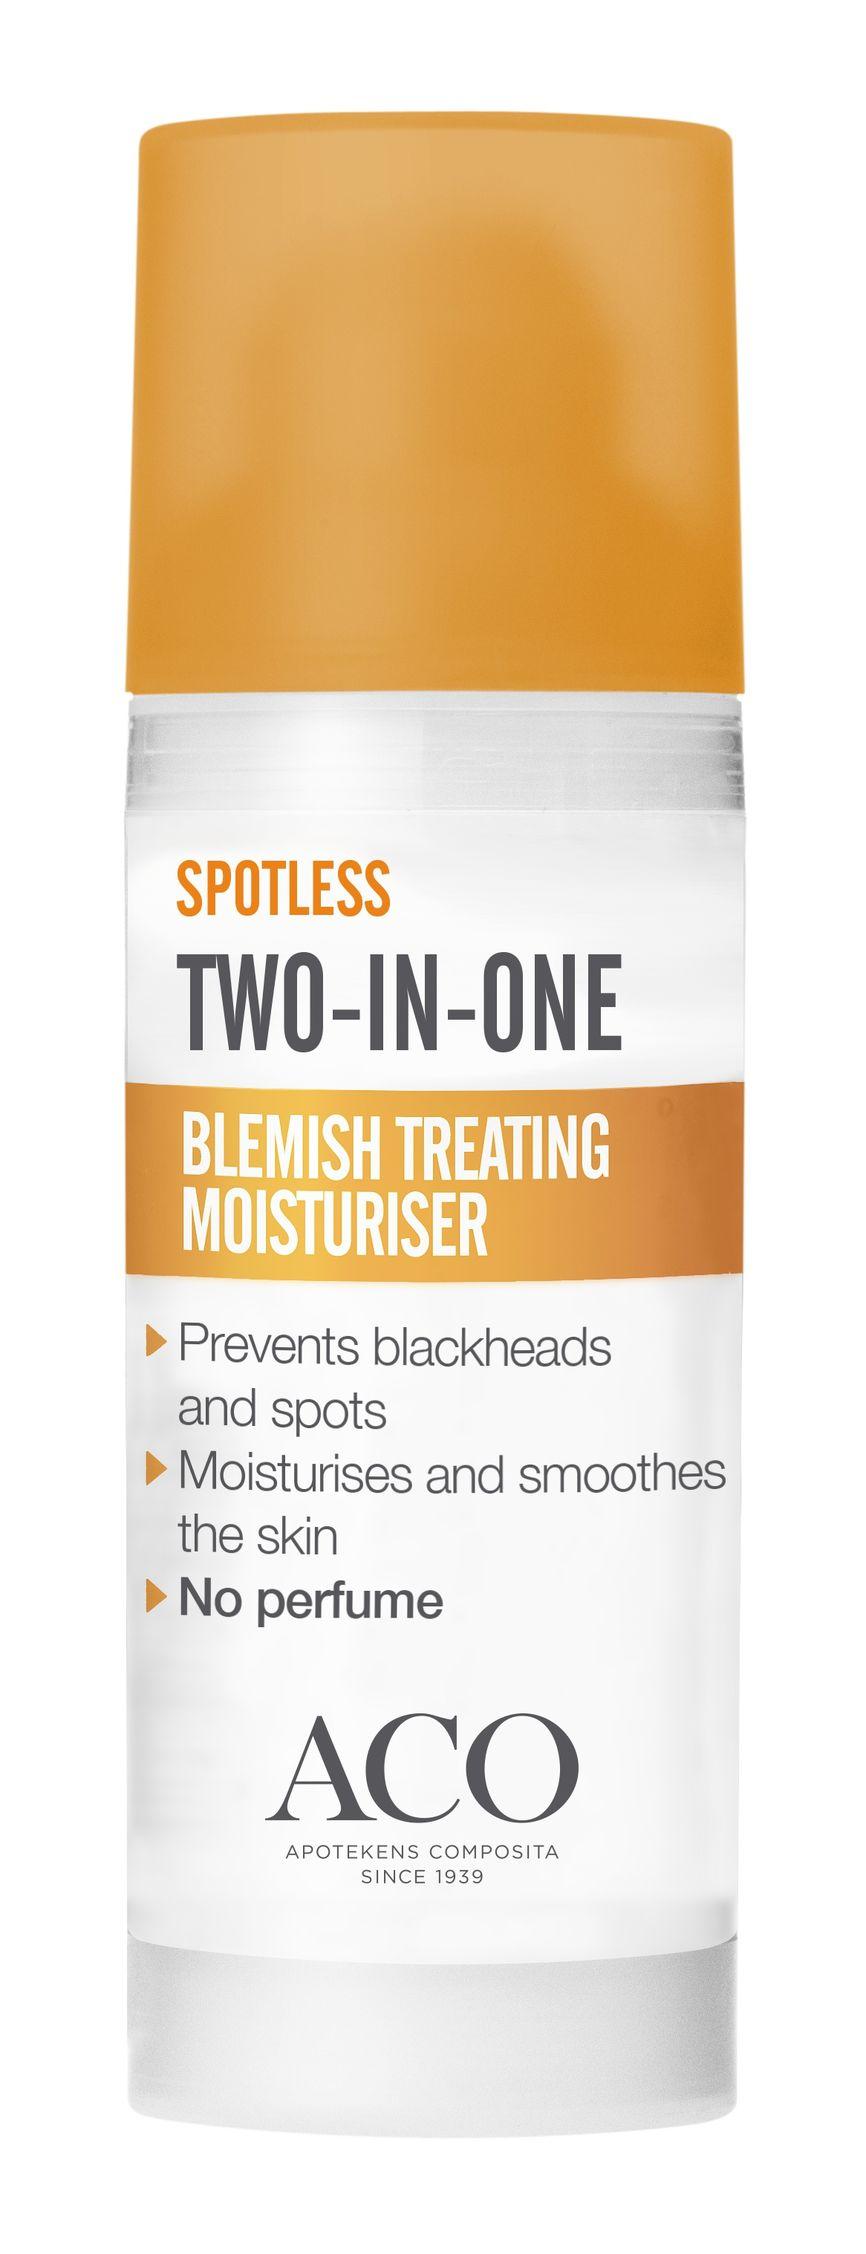 blemish treating moisturiser